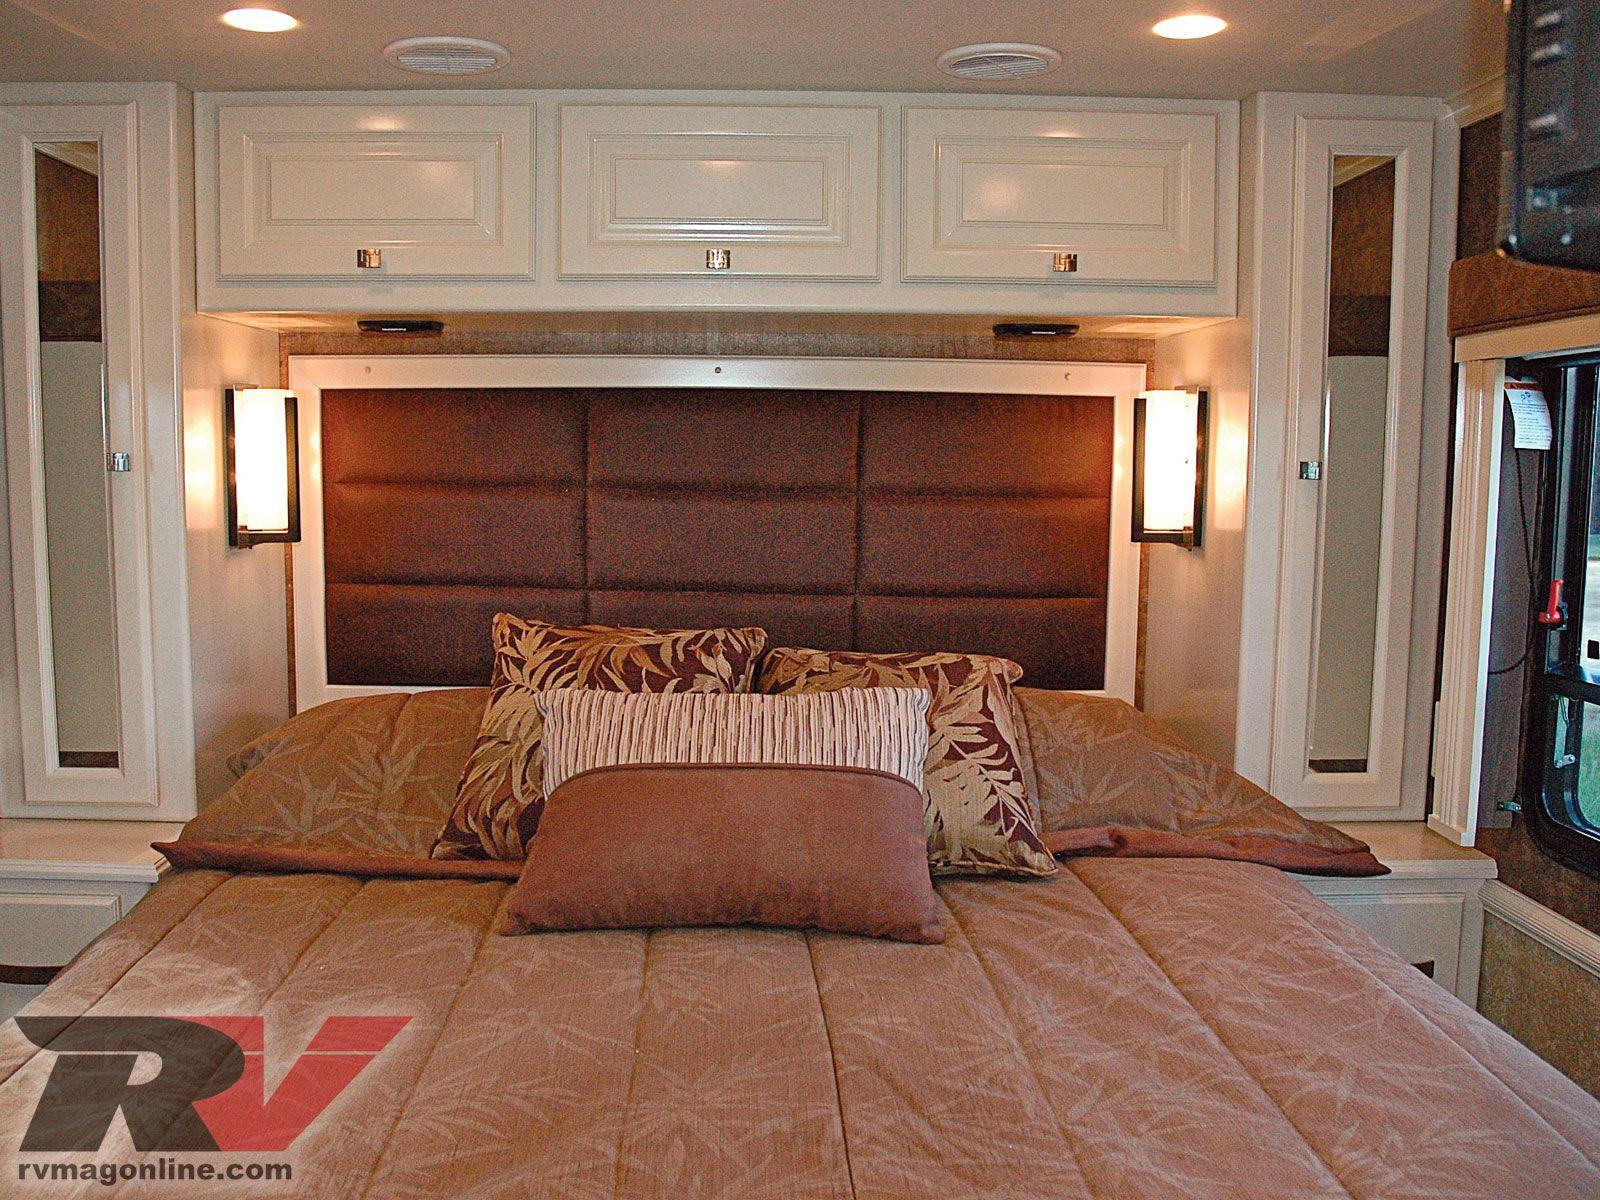 Rv Bedroom Ideas Allegro Breeze Compact Class A Motorhome Bedroom Photo 6 Rv Trailer Decor